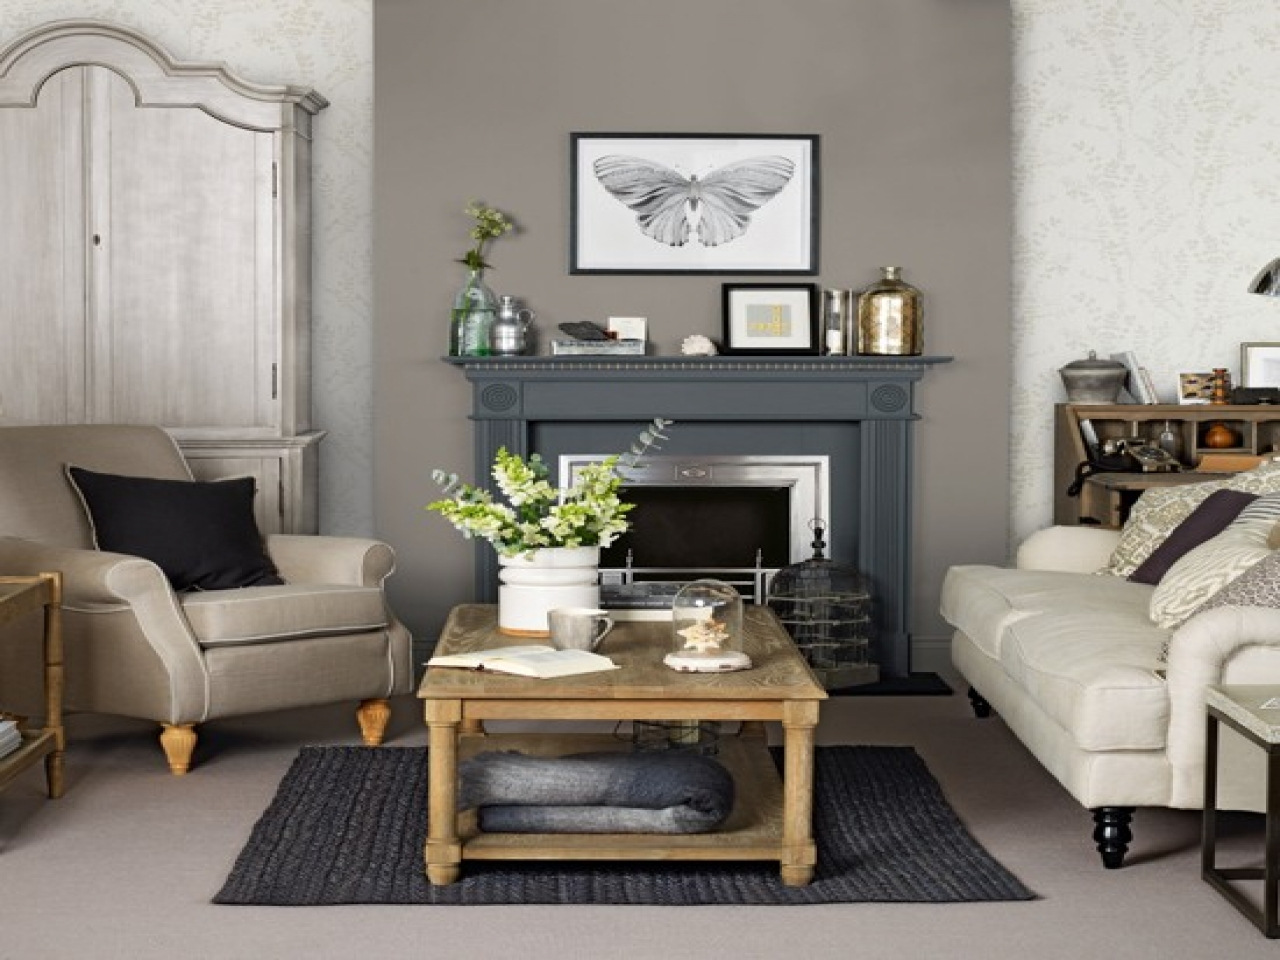 Hausratversicherungkosten Best Ideas Enchanting Gray Brown Living Room Collection 6298